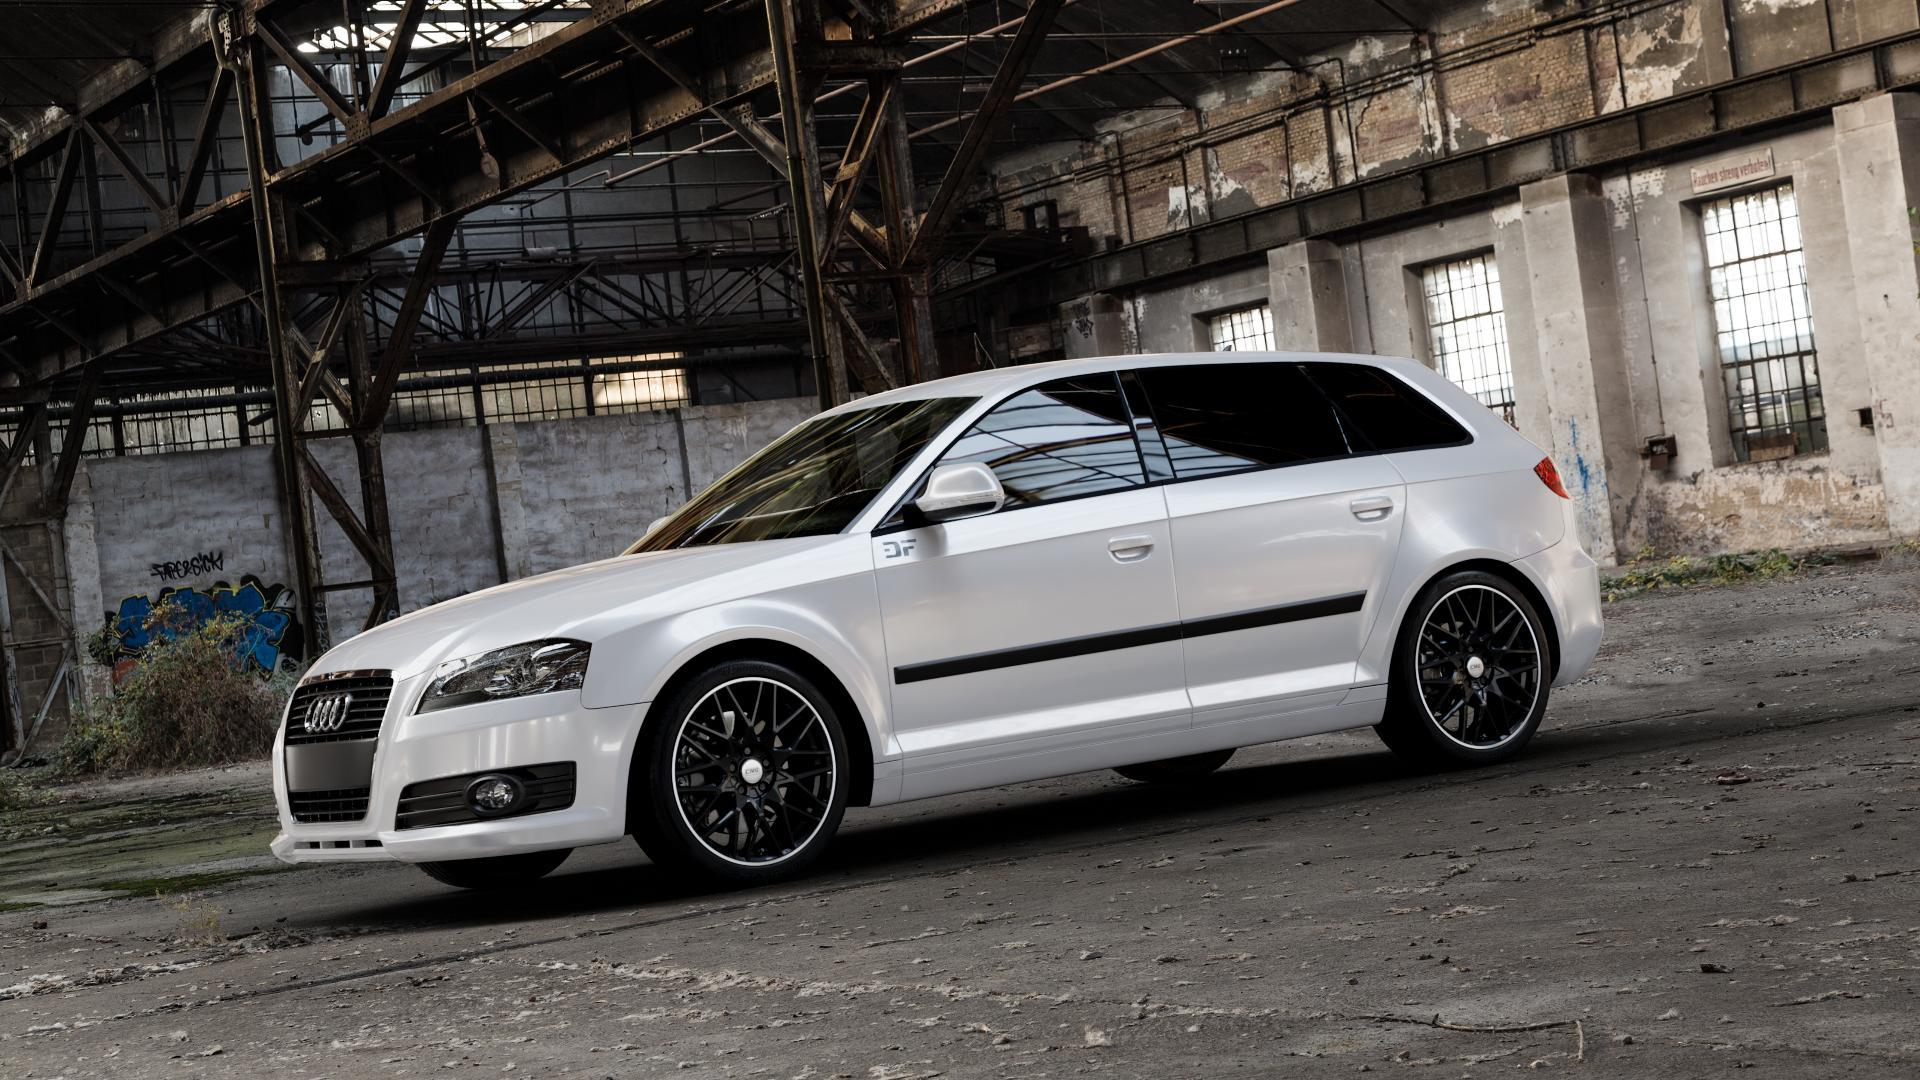 CMS C25 Diamond Rim Black Felge mit Reifen grau schwarz in 18Zoll Winterfelge Alufelge auf weissem Audi A3 Typ 8P (Sportback) 1,6l 75kW (102 PS) 2,0l FSI 110kW (150 1,9l TDI 77kW (105 103kW (140 TFSI 147kW (200 85kW (116 100kW (136 1,8l 118kW (160 125kW (170 1,4l 92kW (125 120kW (163 quattro 3,2l V6 184kW (250 S3 195kW (265 1,2l 66kW (90 18